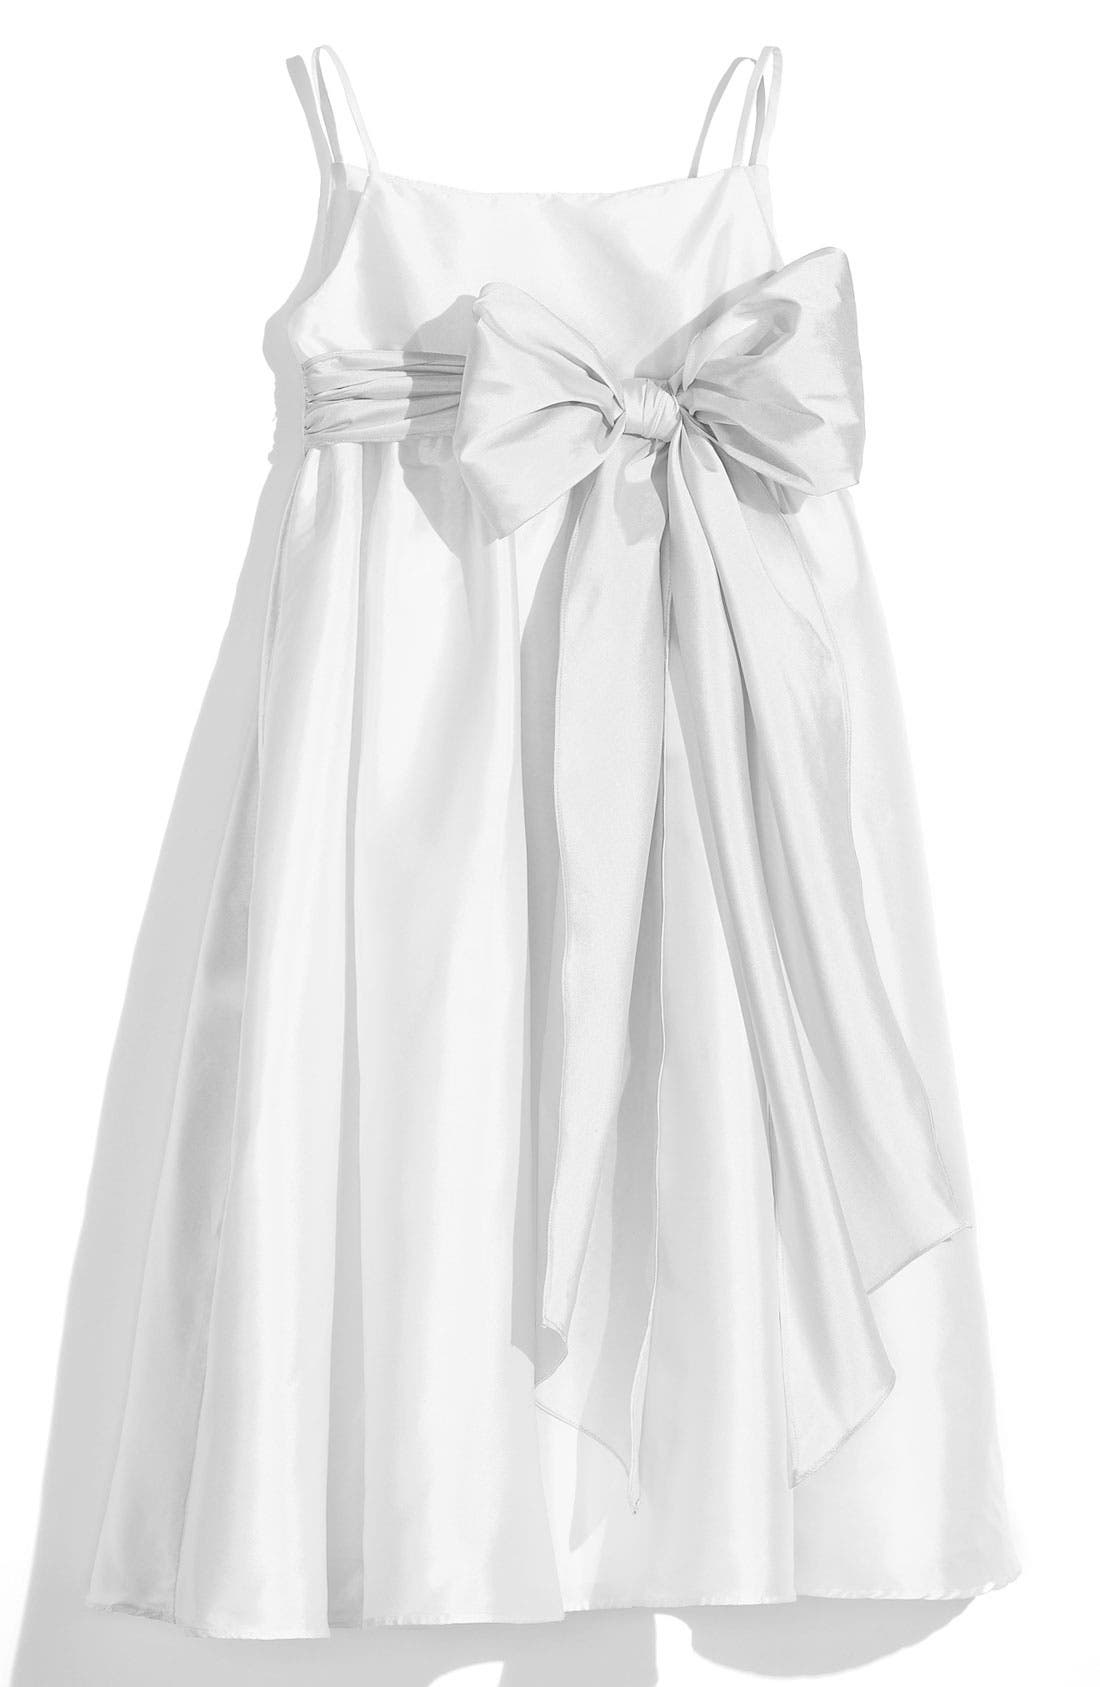 White Sleeveless Empire Waist Taffeta Dress,                             Main thumbnail 1, color,                             White/ White